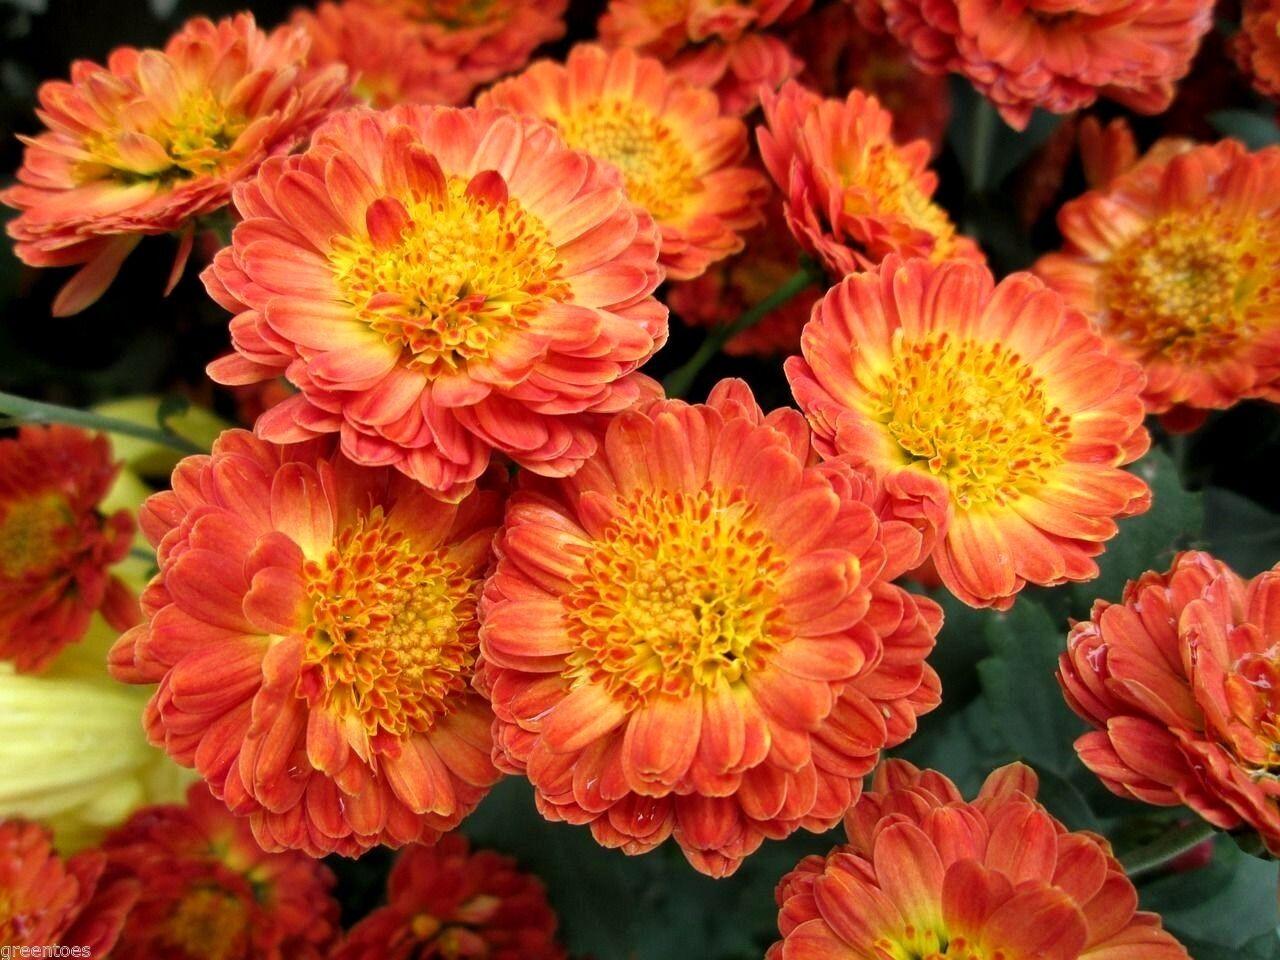 Hardy Chrysanthemum Garden Mums Indicum Mix Large Variety Perennial